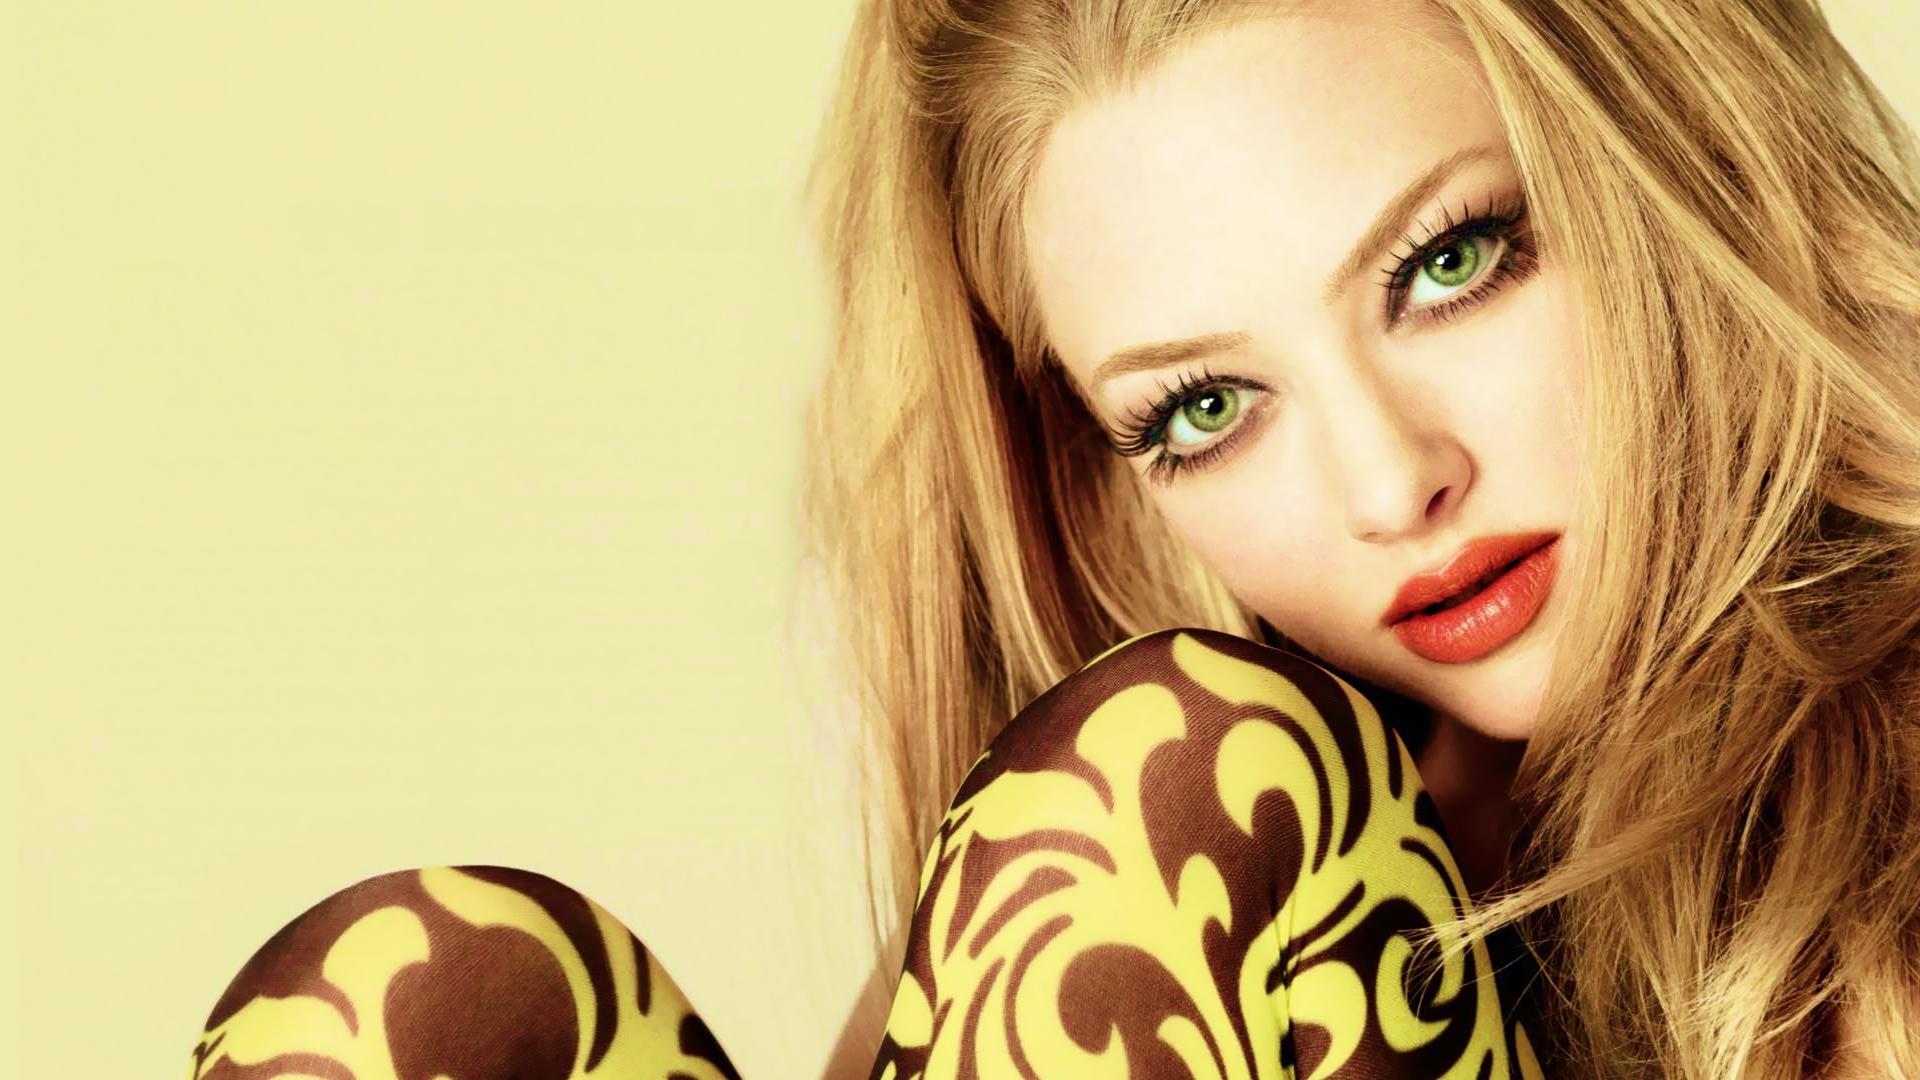 Amanda Seyfried High Quality Wallpapers